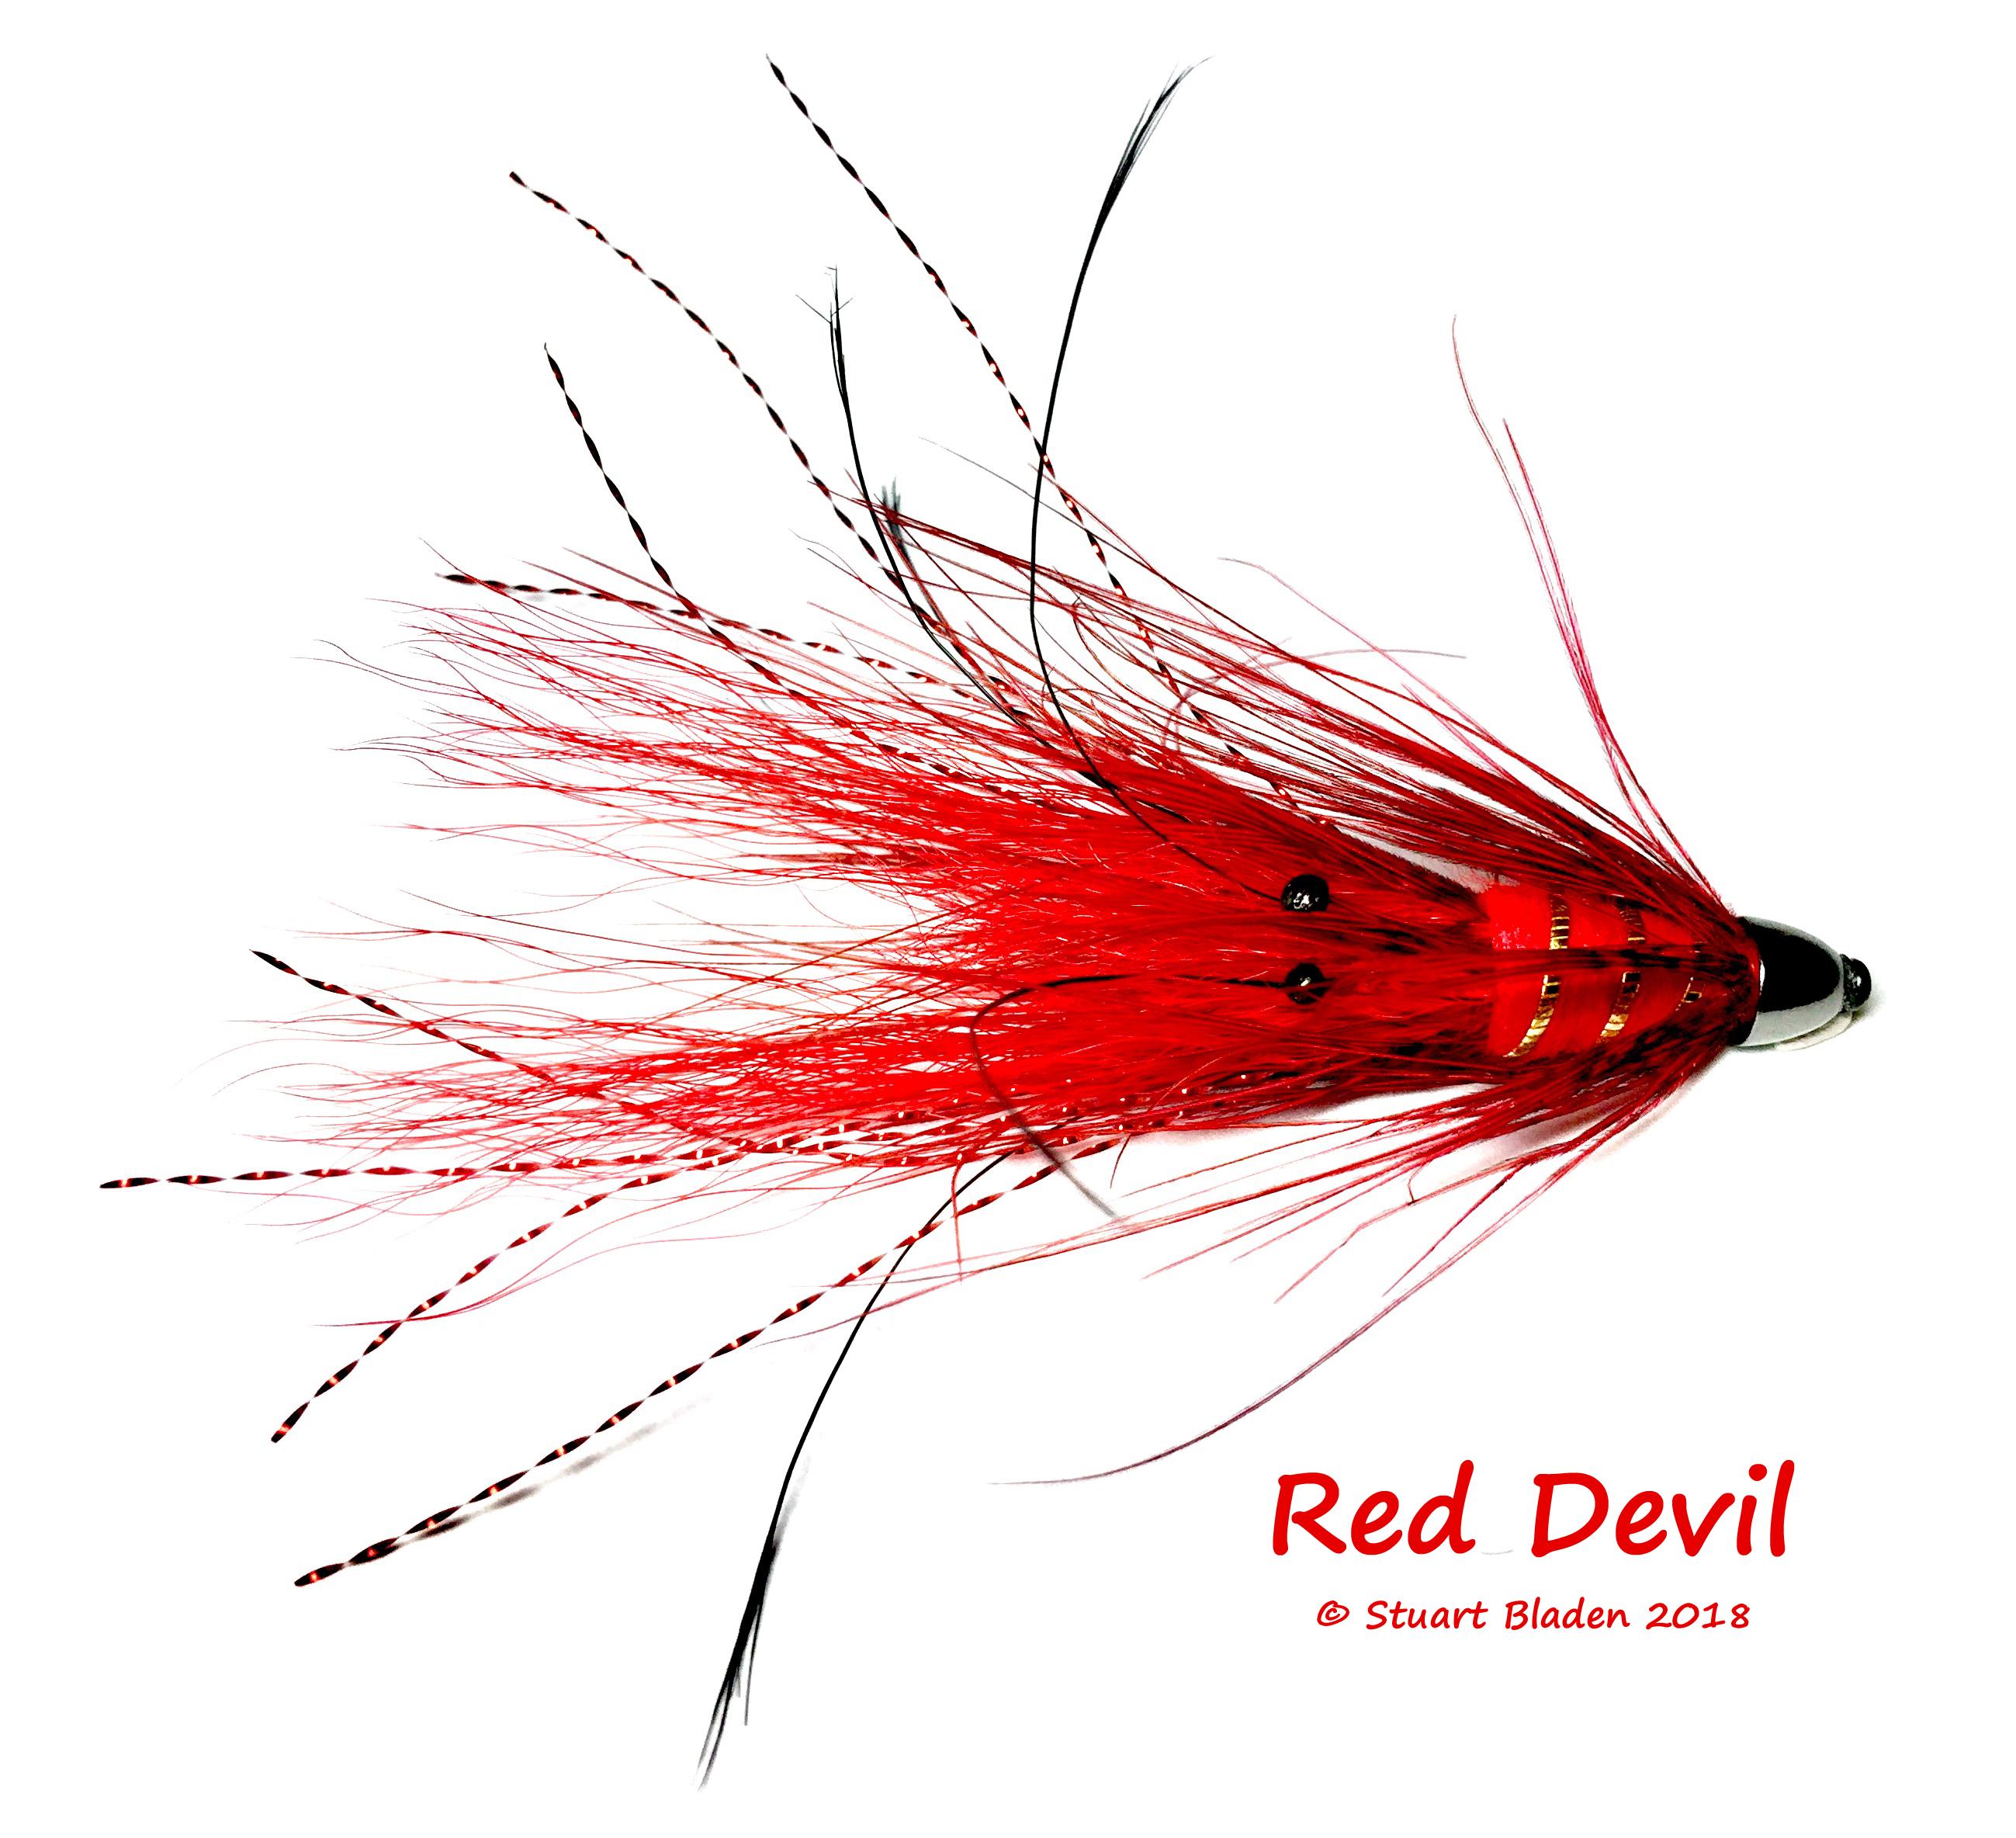 Red-devil1t.jpg